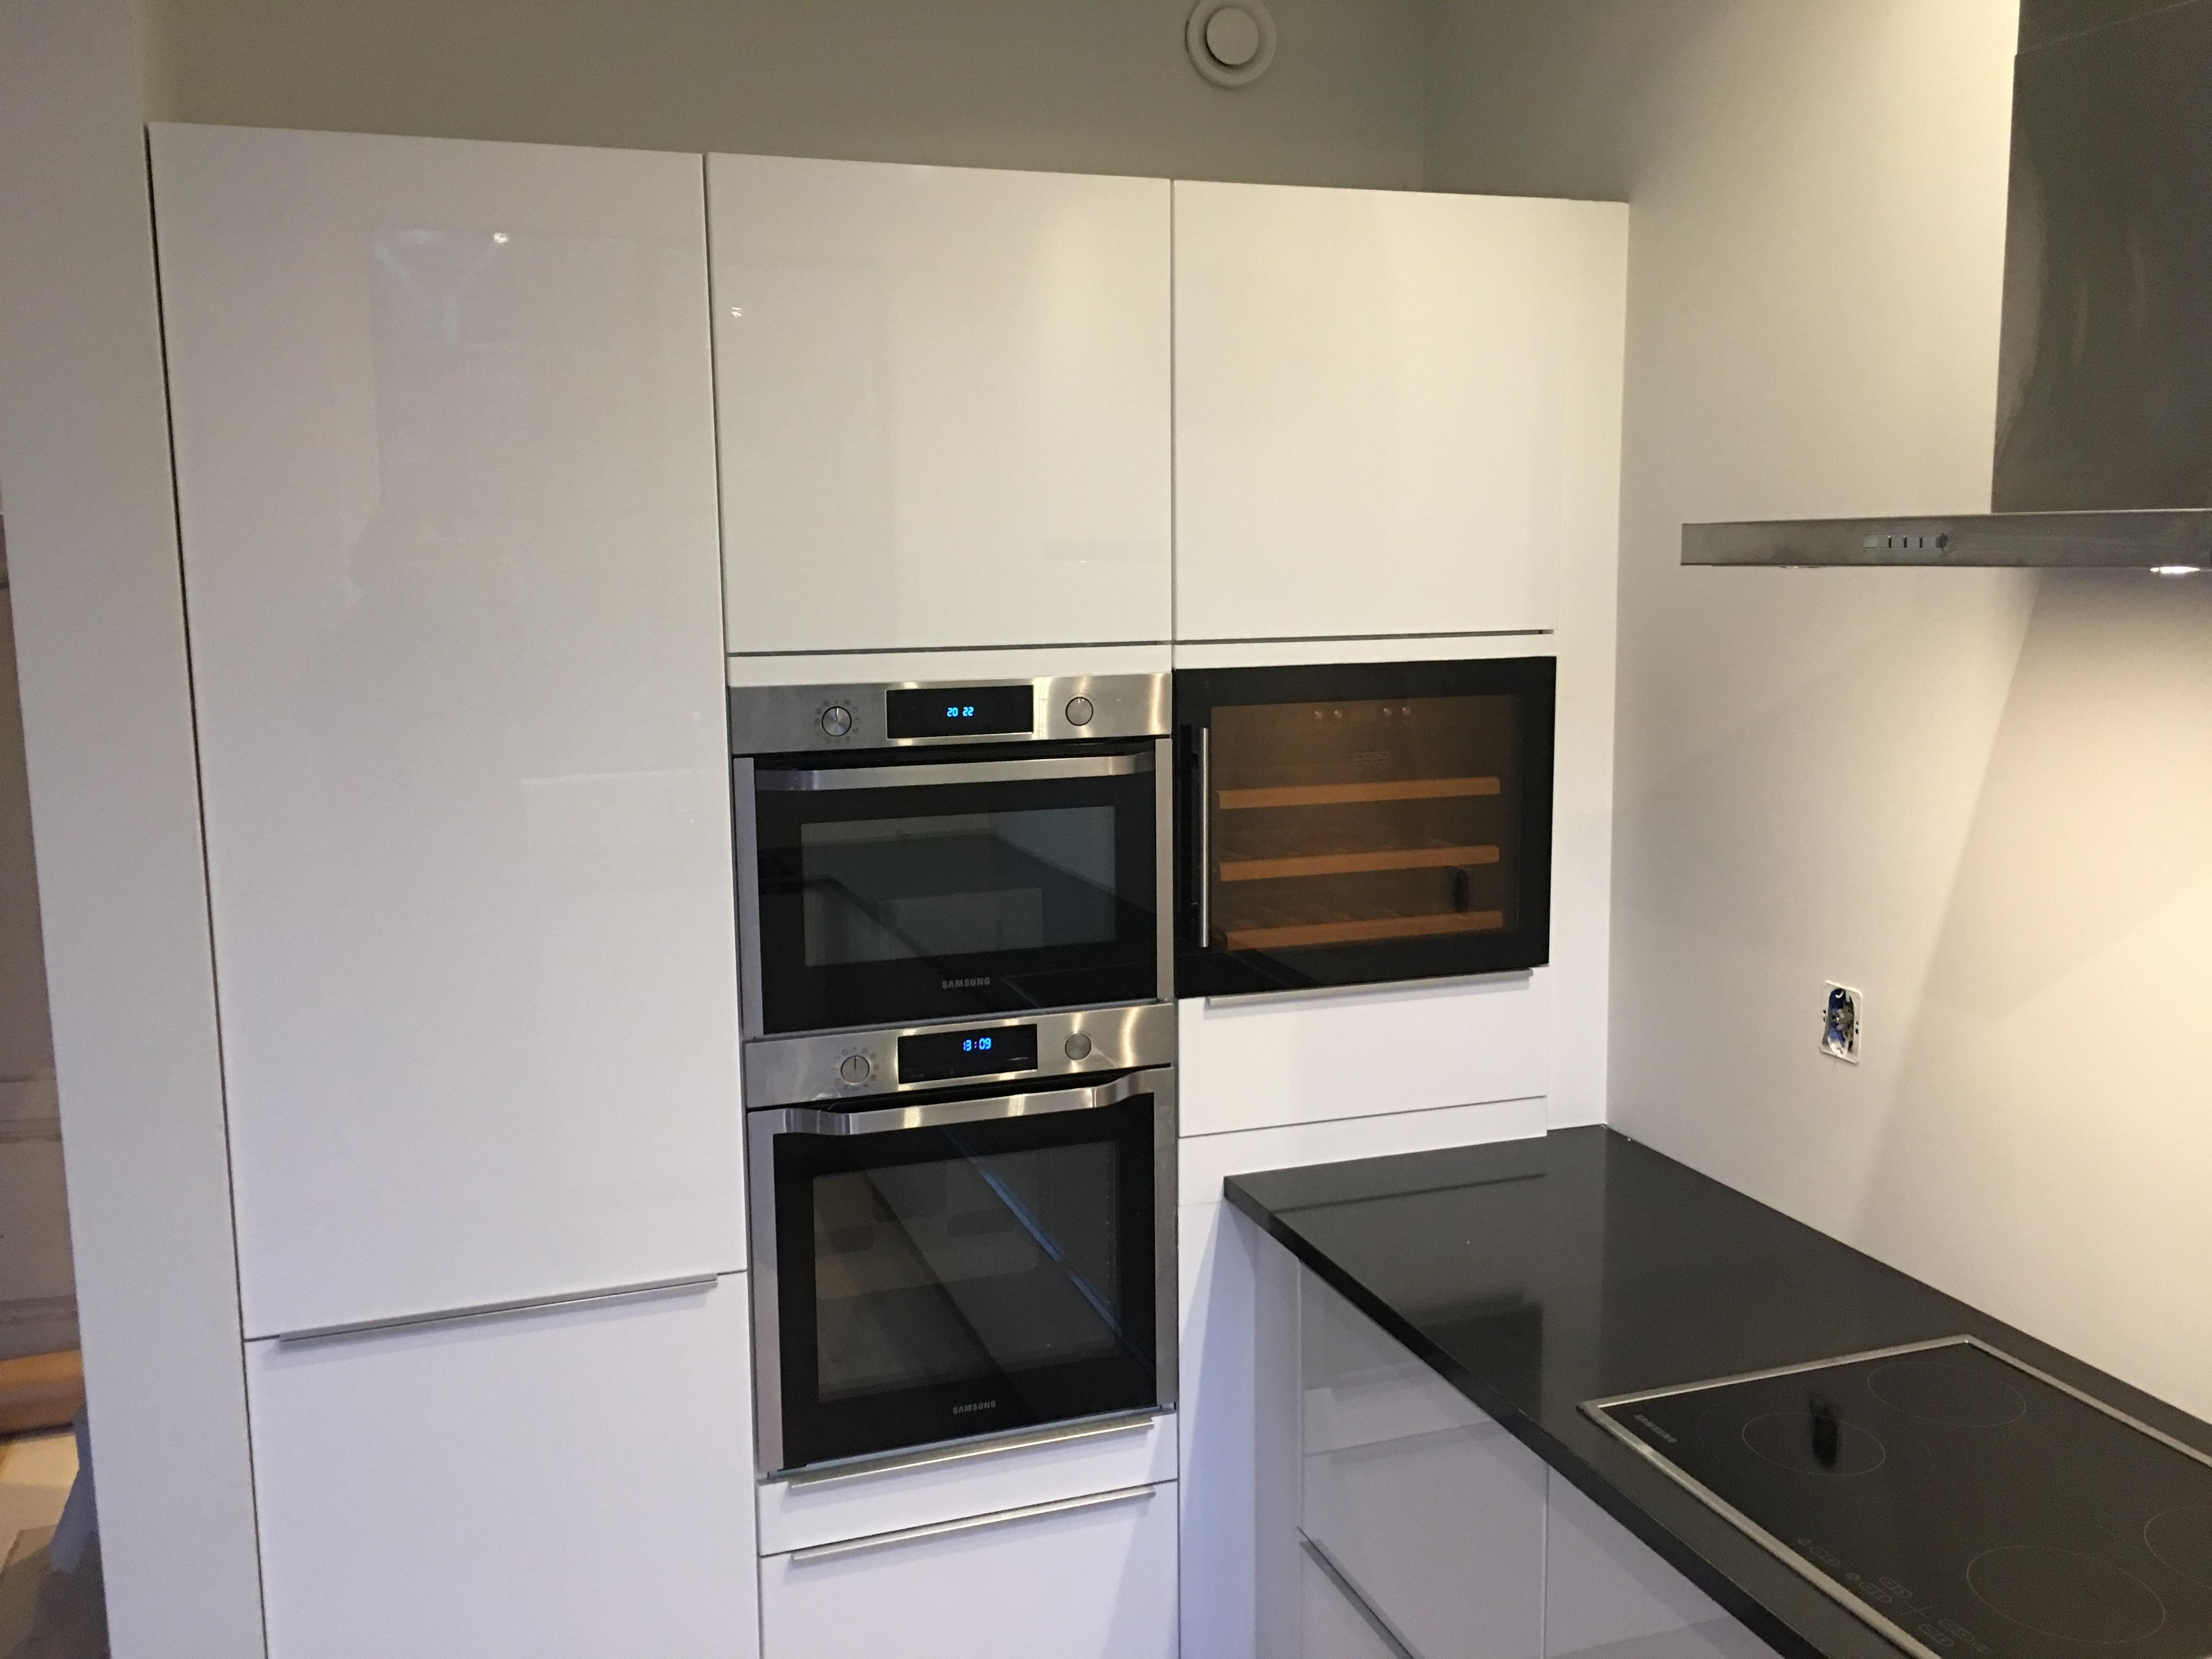 Ikea keukenmontage met samsung keukenapparatuur inbouw